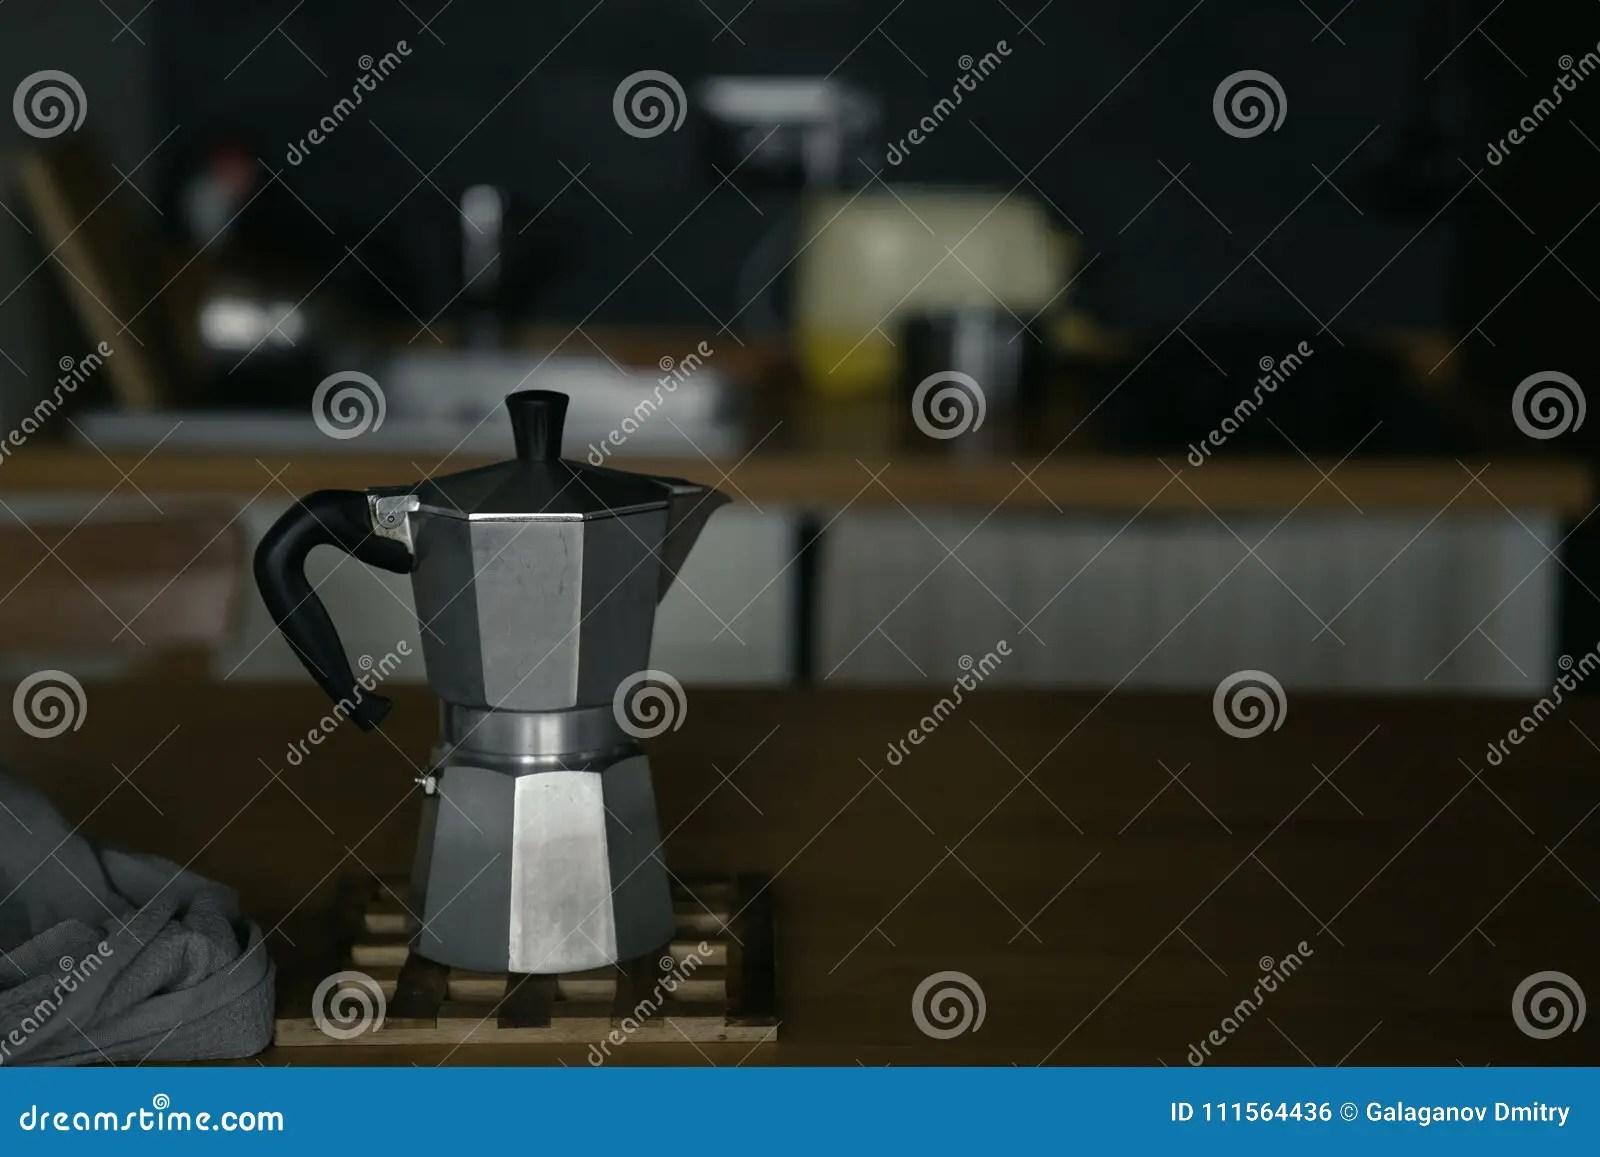 lowes kitchens kitchen remodel app 在桌上的铝传统咖啡壶在低调的厨房内部库存照片 图片包括有背包 浓咖啡 在桌上的铝传统咖啡壶在低调的厨房内部